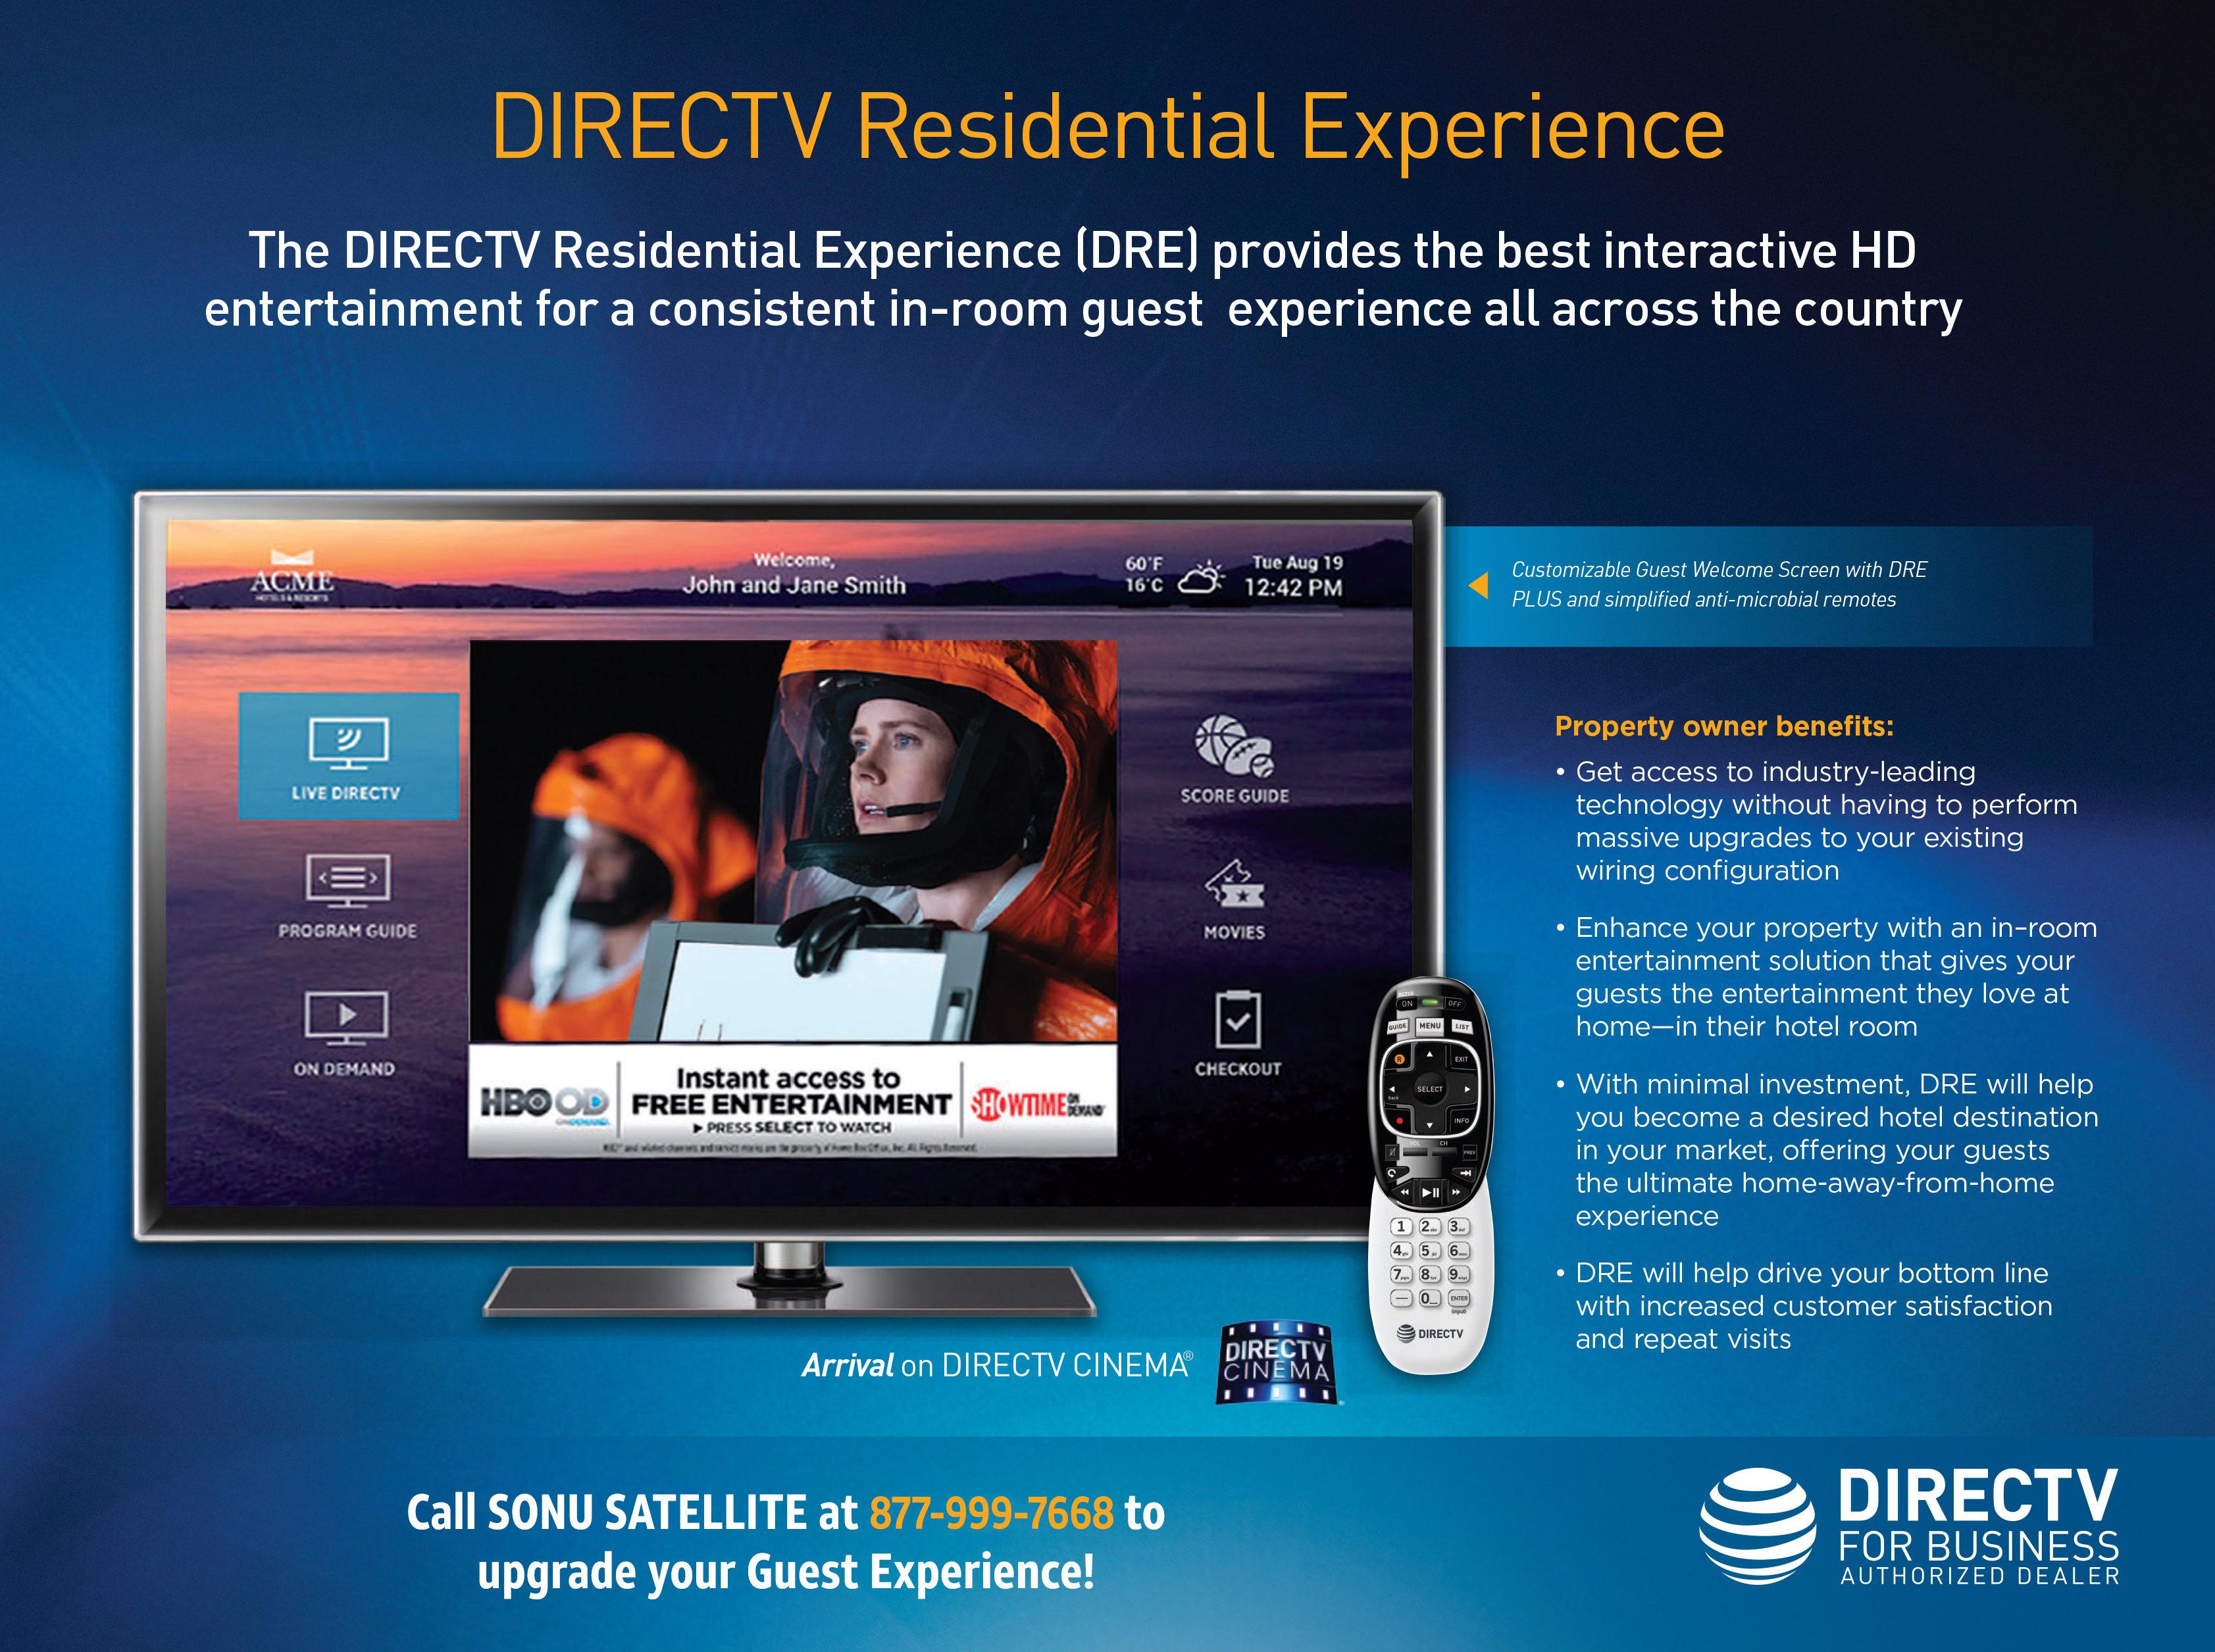 DIRECTV Residential Experience vs DRE Plus